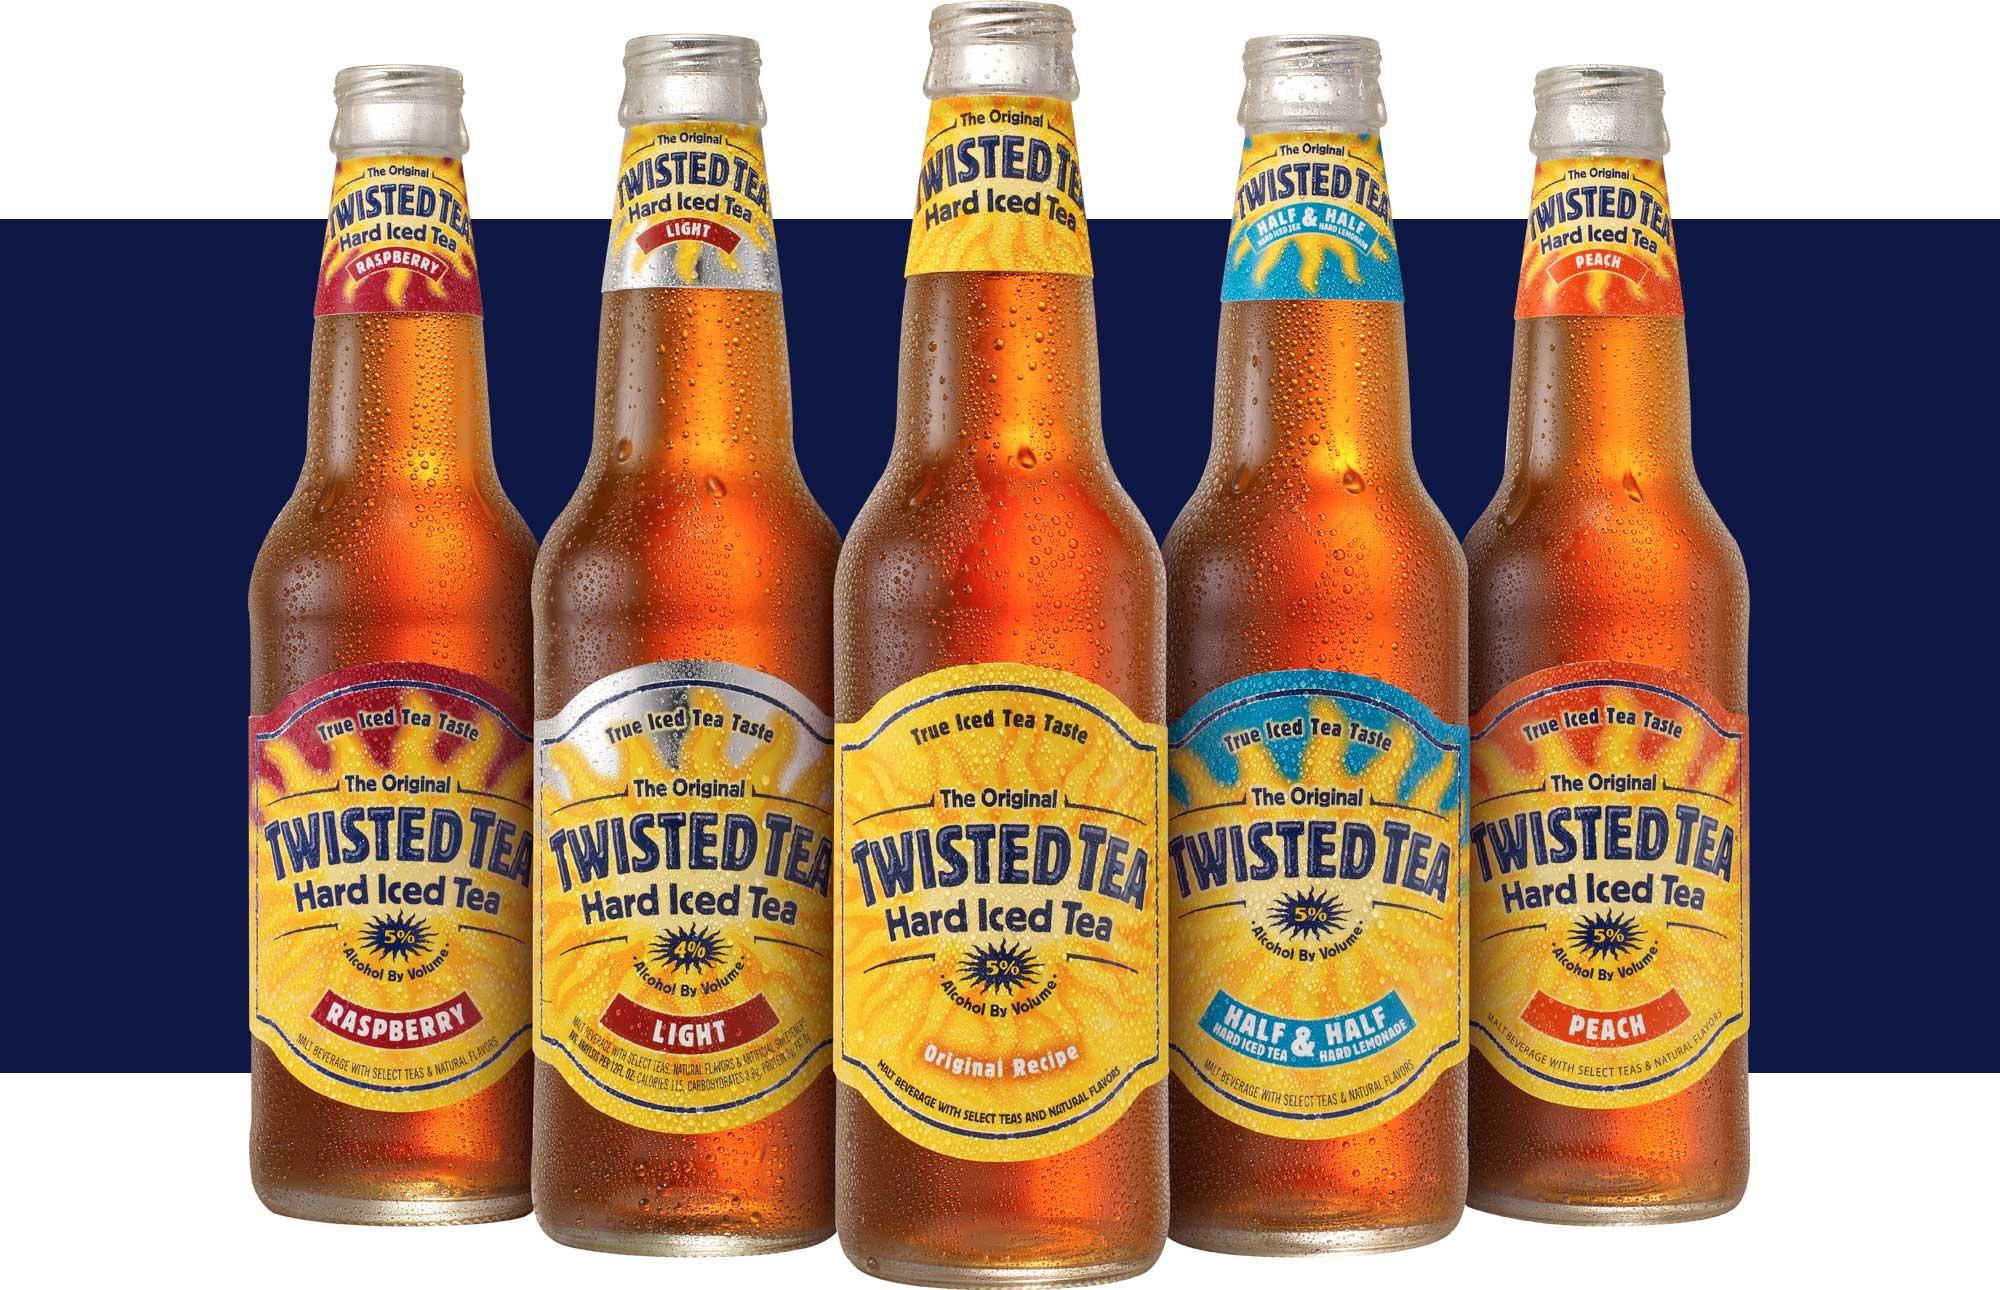 TwistedTea_bottles.jpg